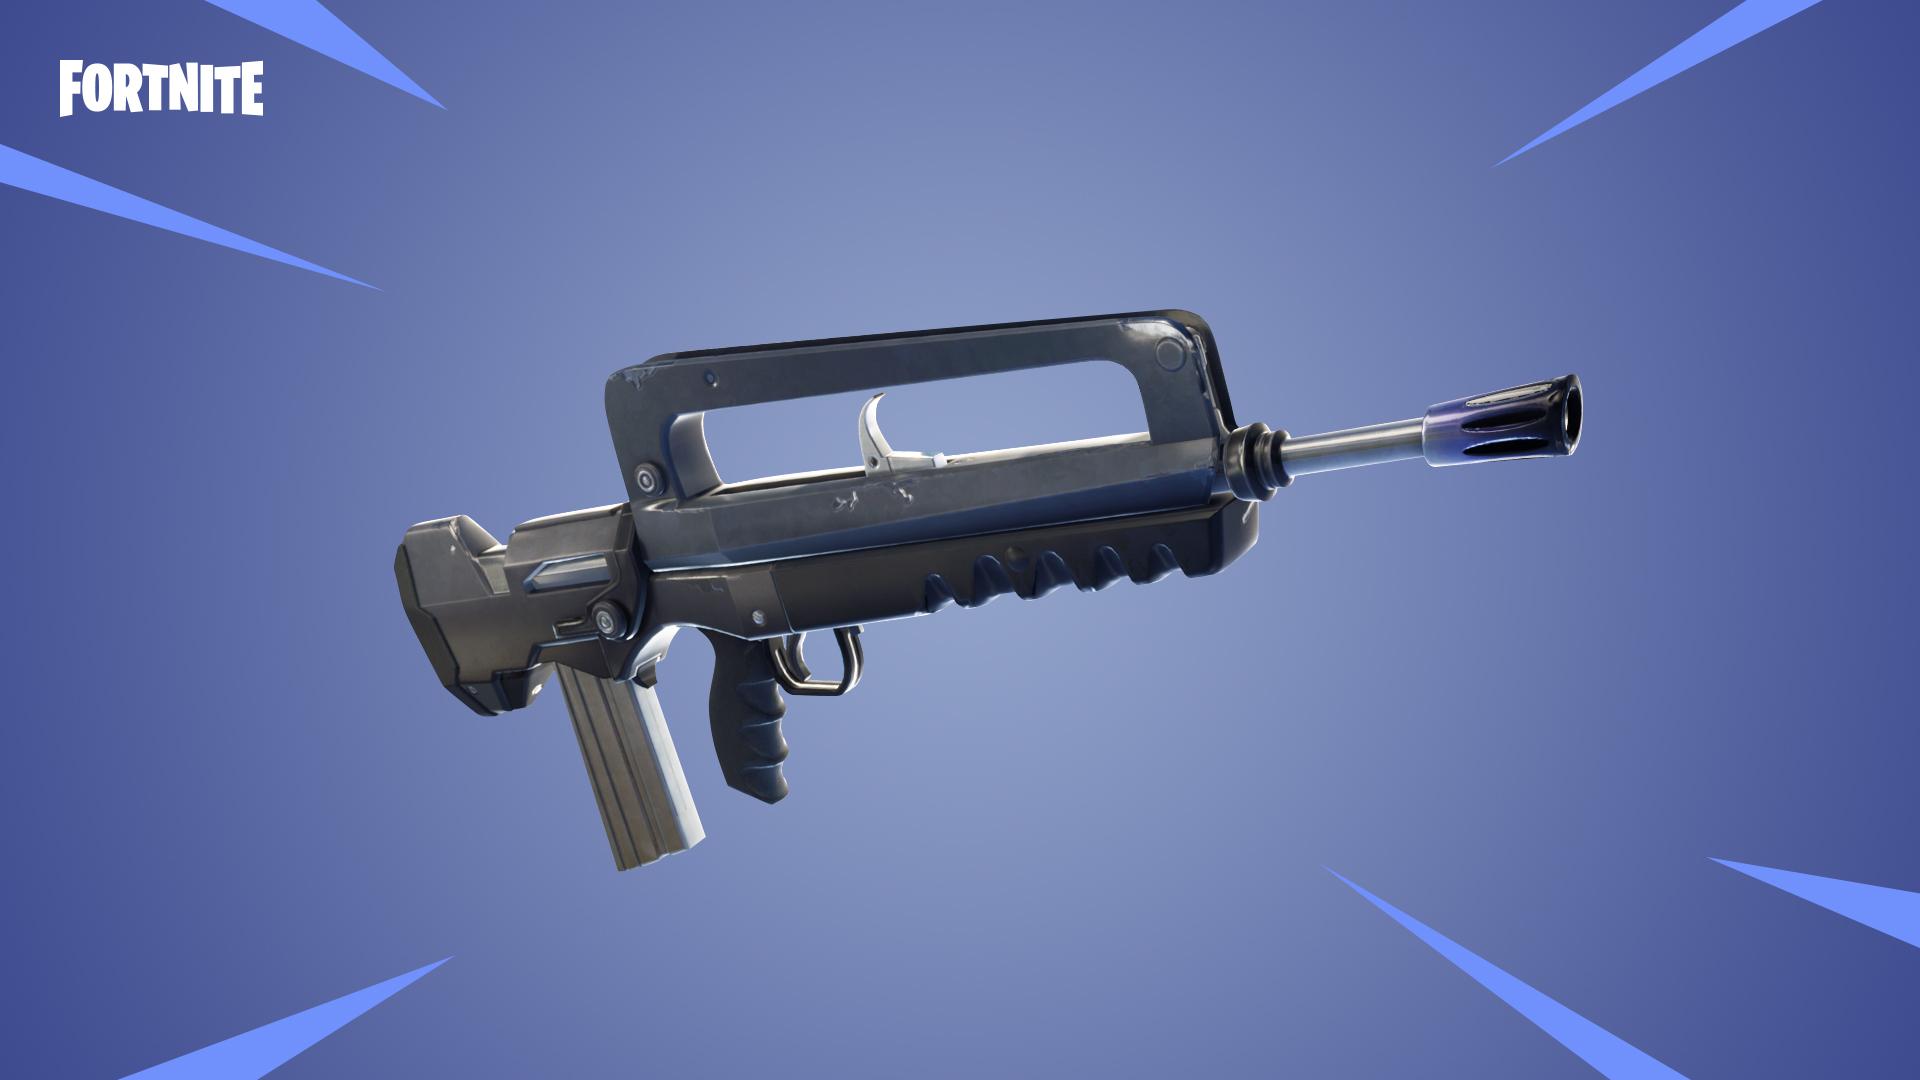 Fortnite 4 2 patch adds Burst Assault Rifles, health